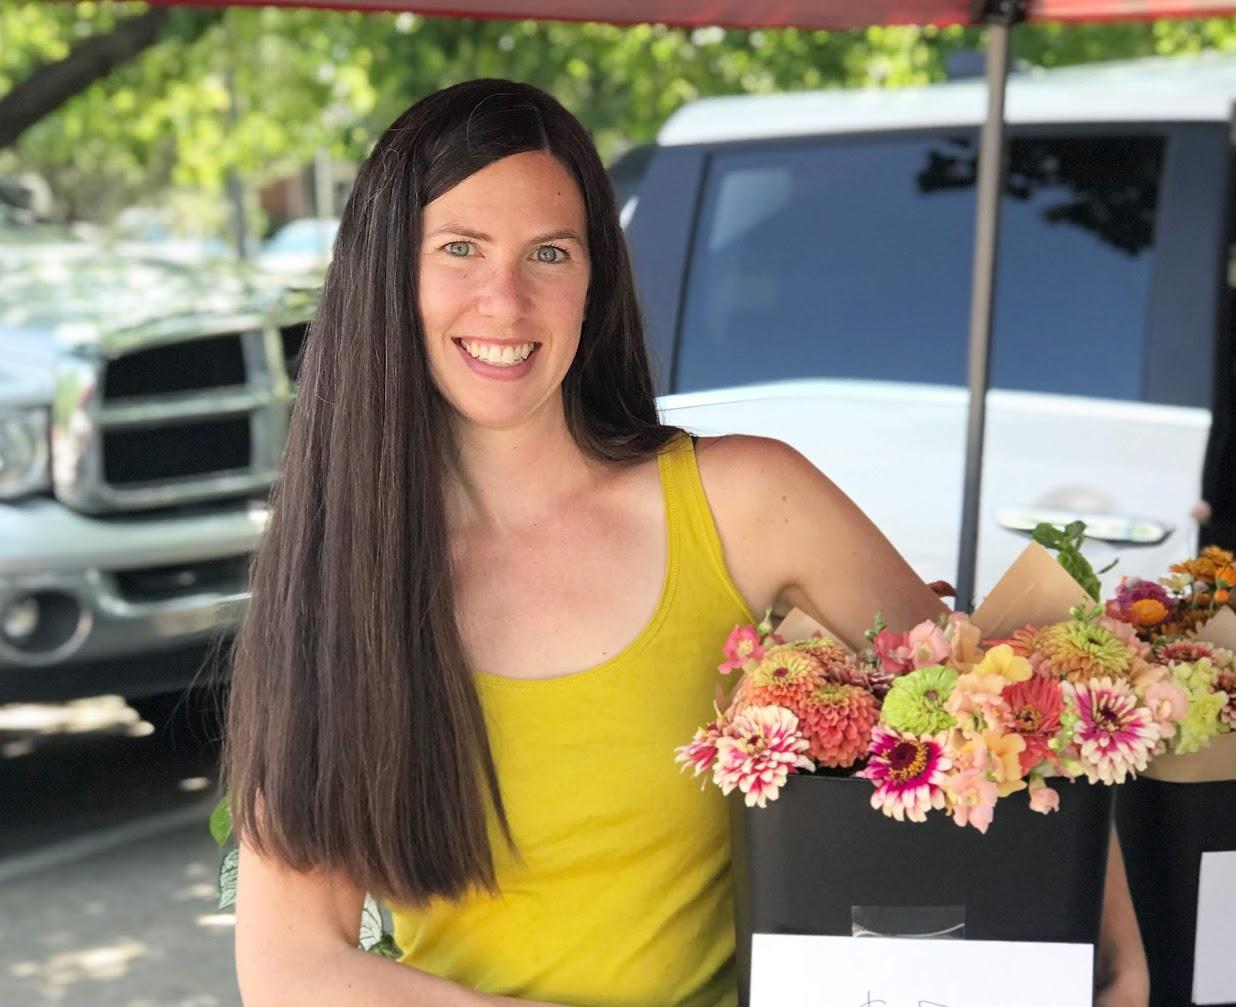 Florist at farmers market.